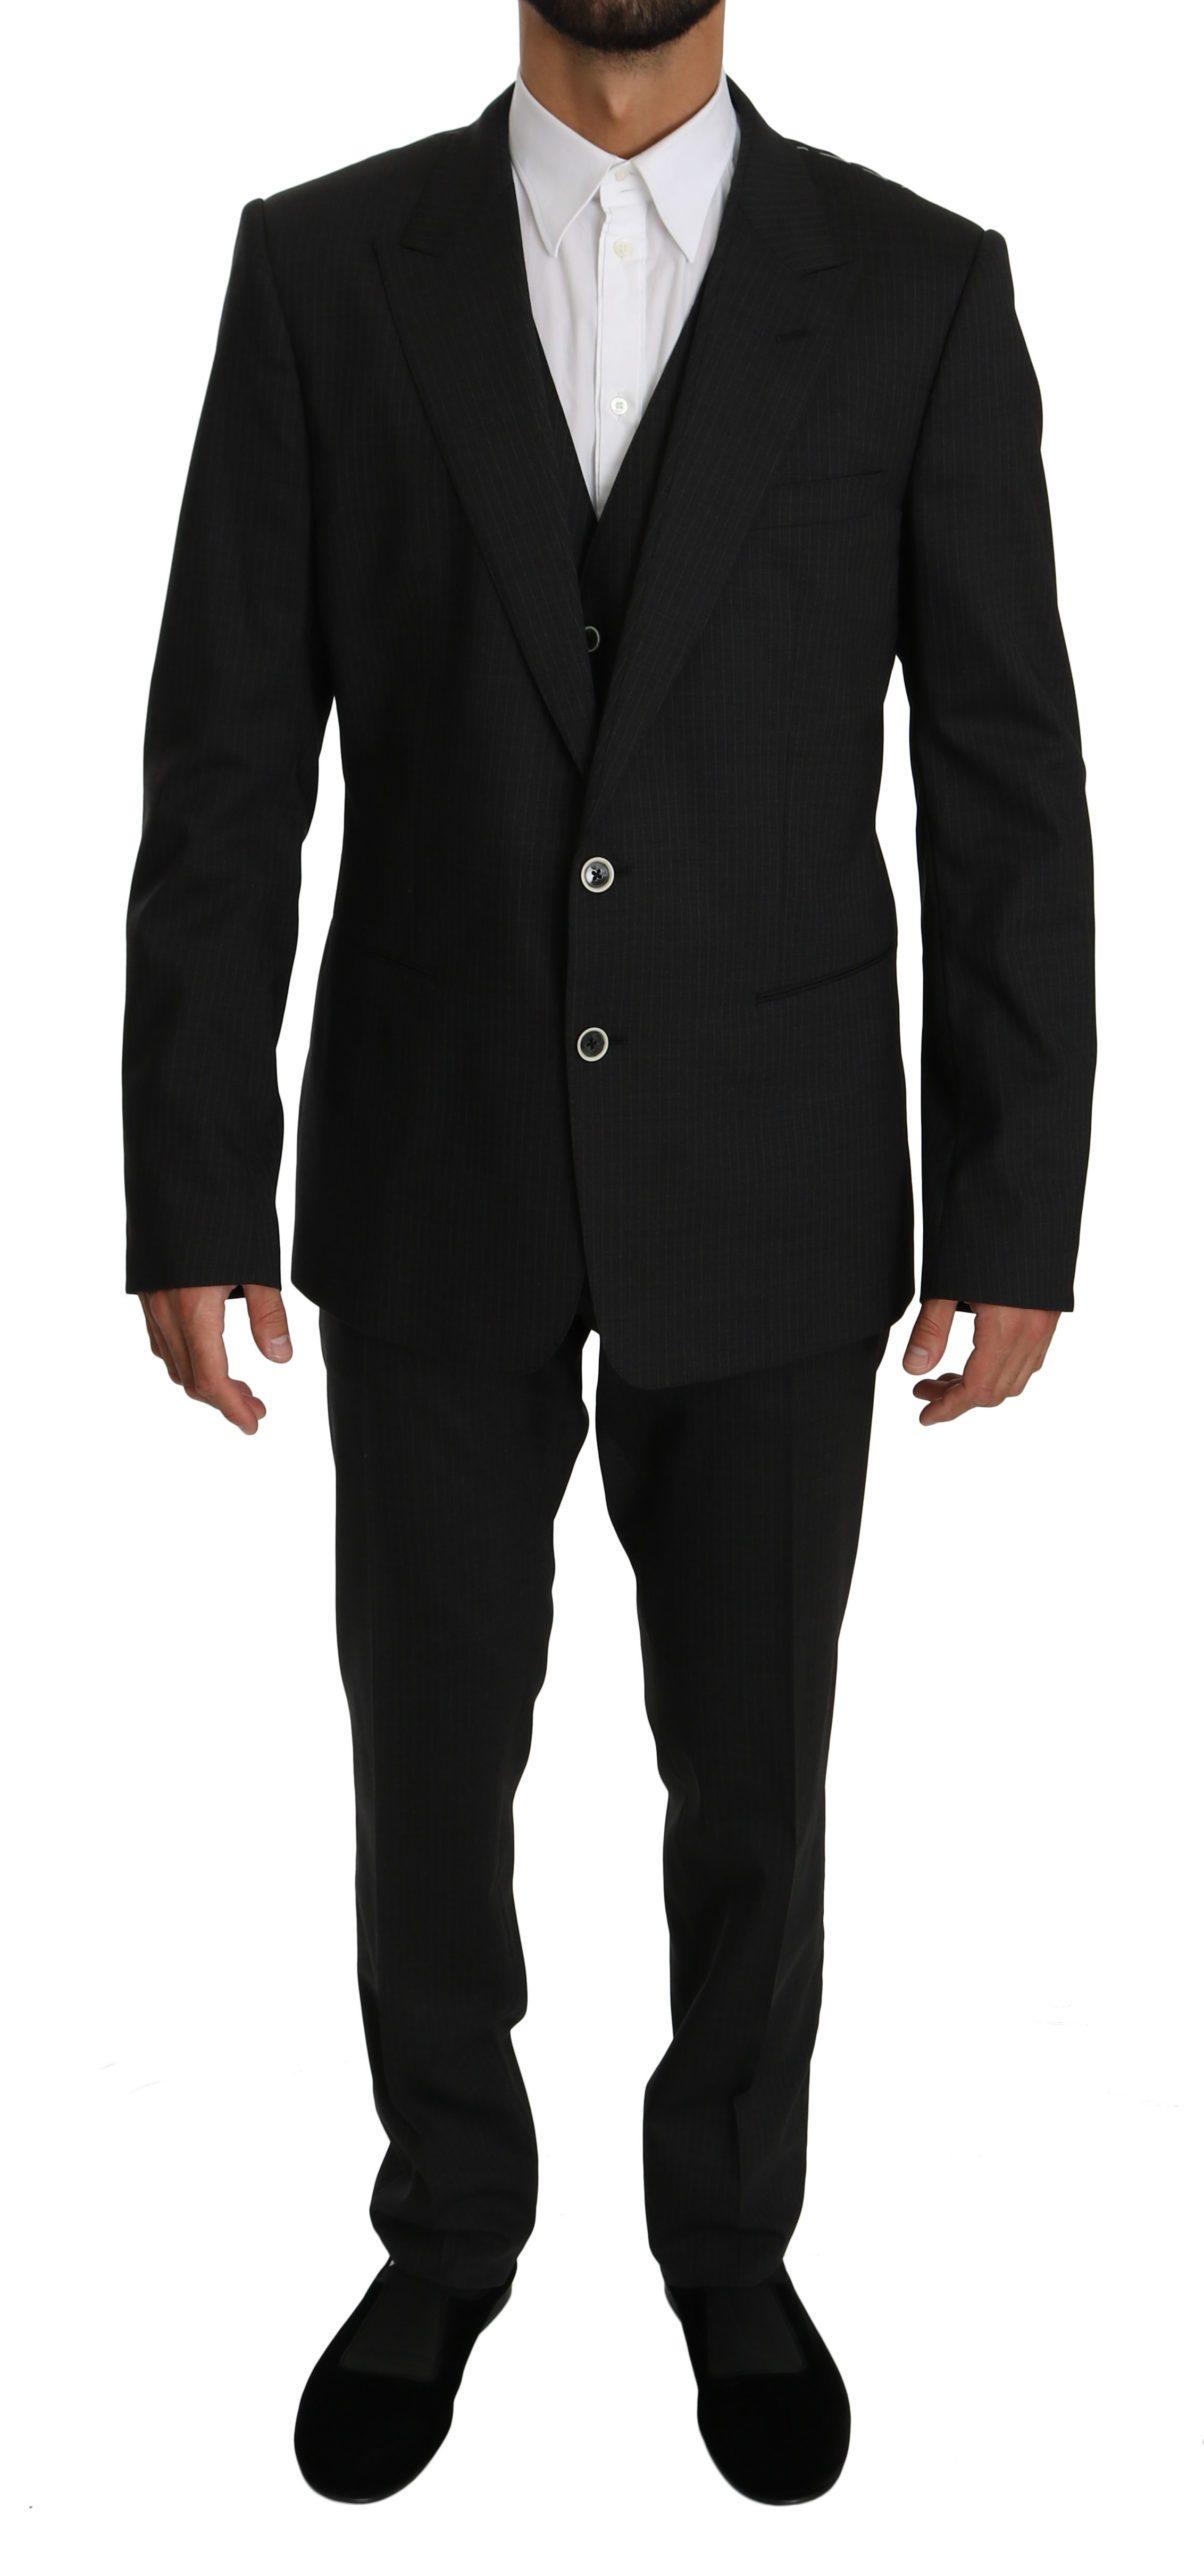 Dolce & Gabbana Men's Striped Wool Stretch Slim Fit Suit Black KOS1562 - IT54 | XL